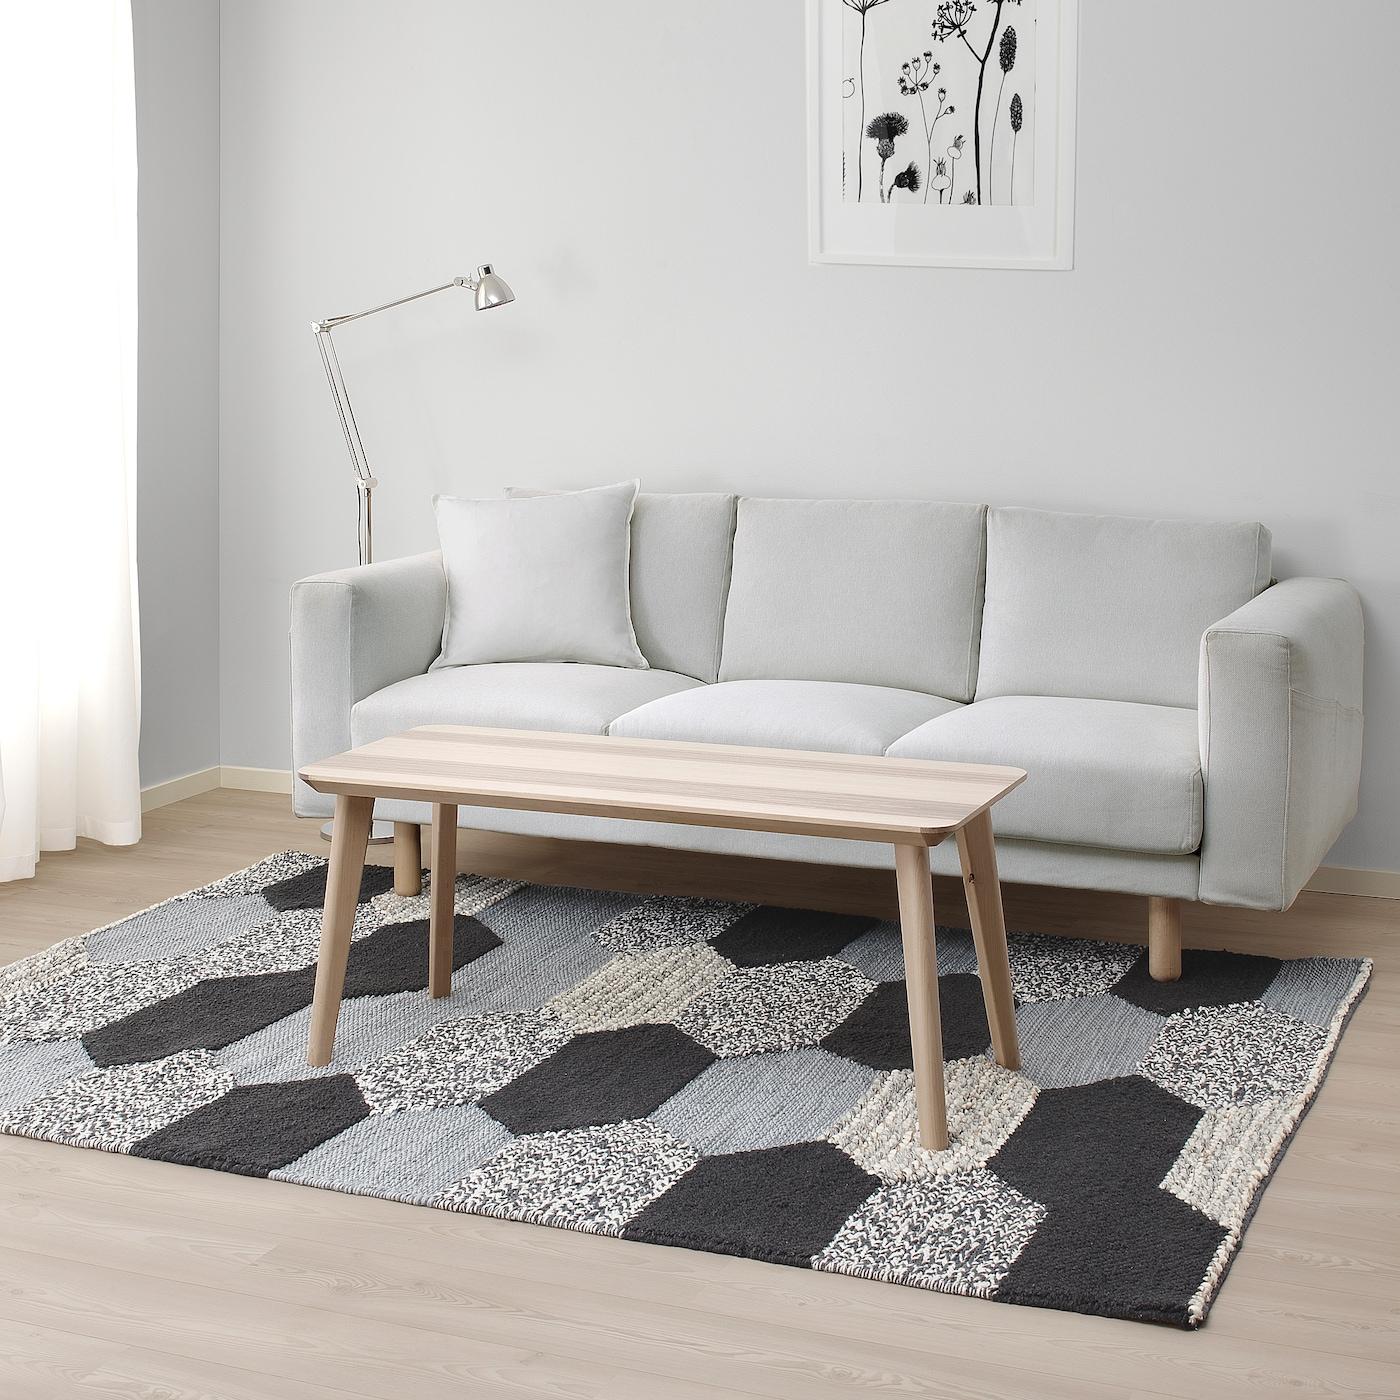 Kollund Teppich Flach Gewebt Handarbeit Grau Ikea Schweiz